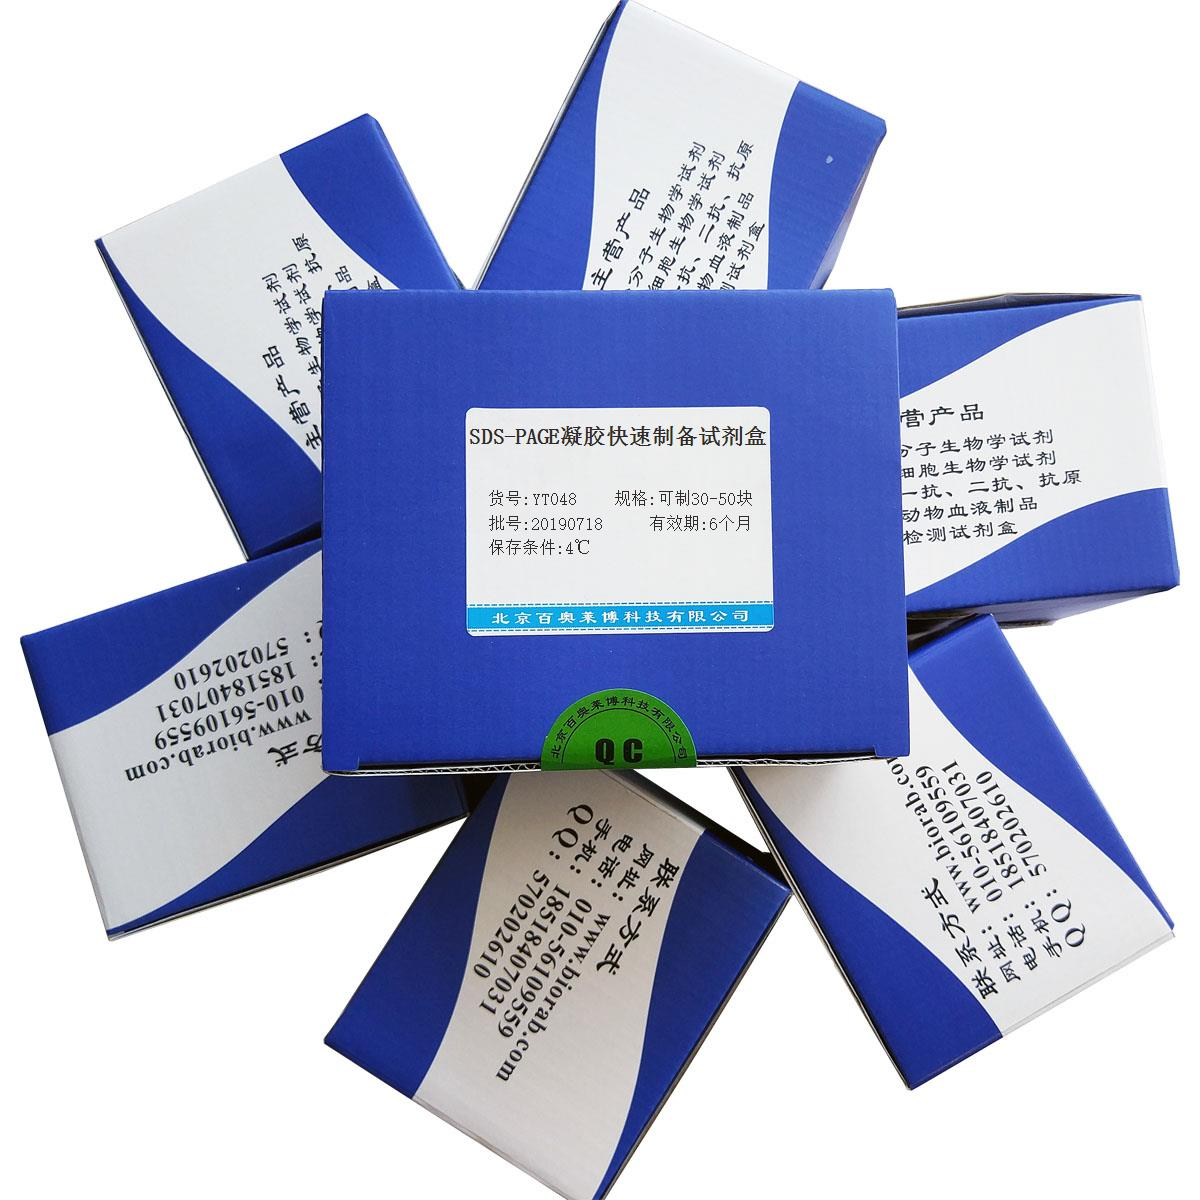 SDS-PAGE凝胶快速制备试剂盒北京厂家